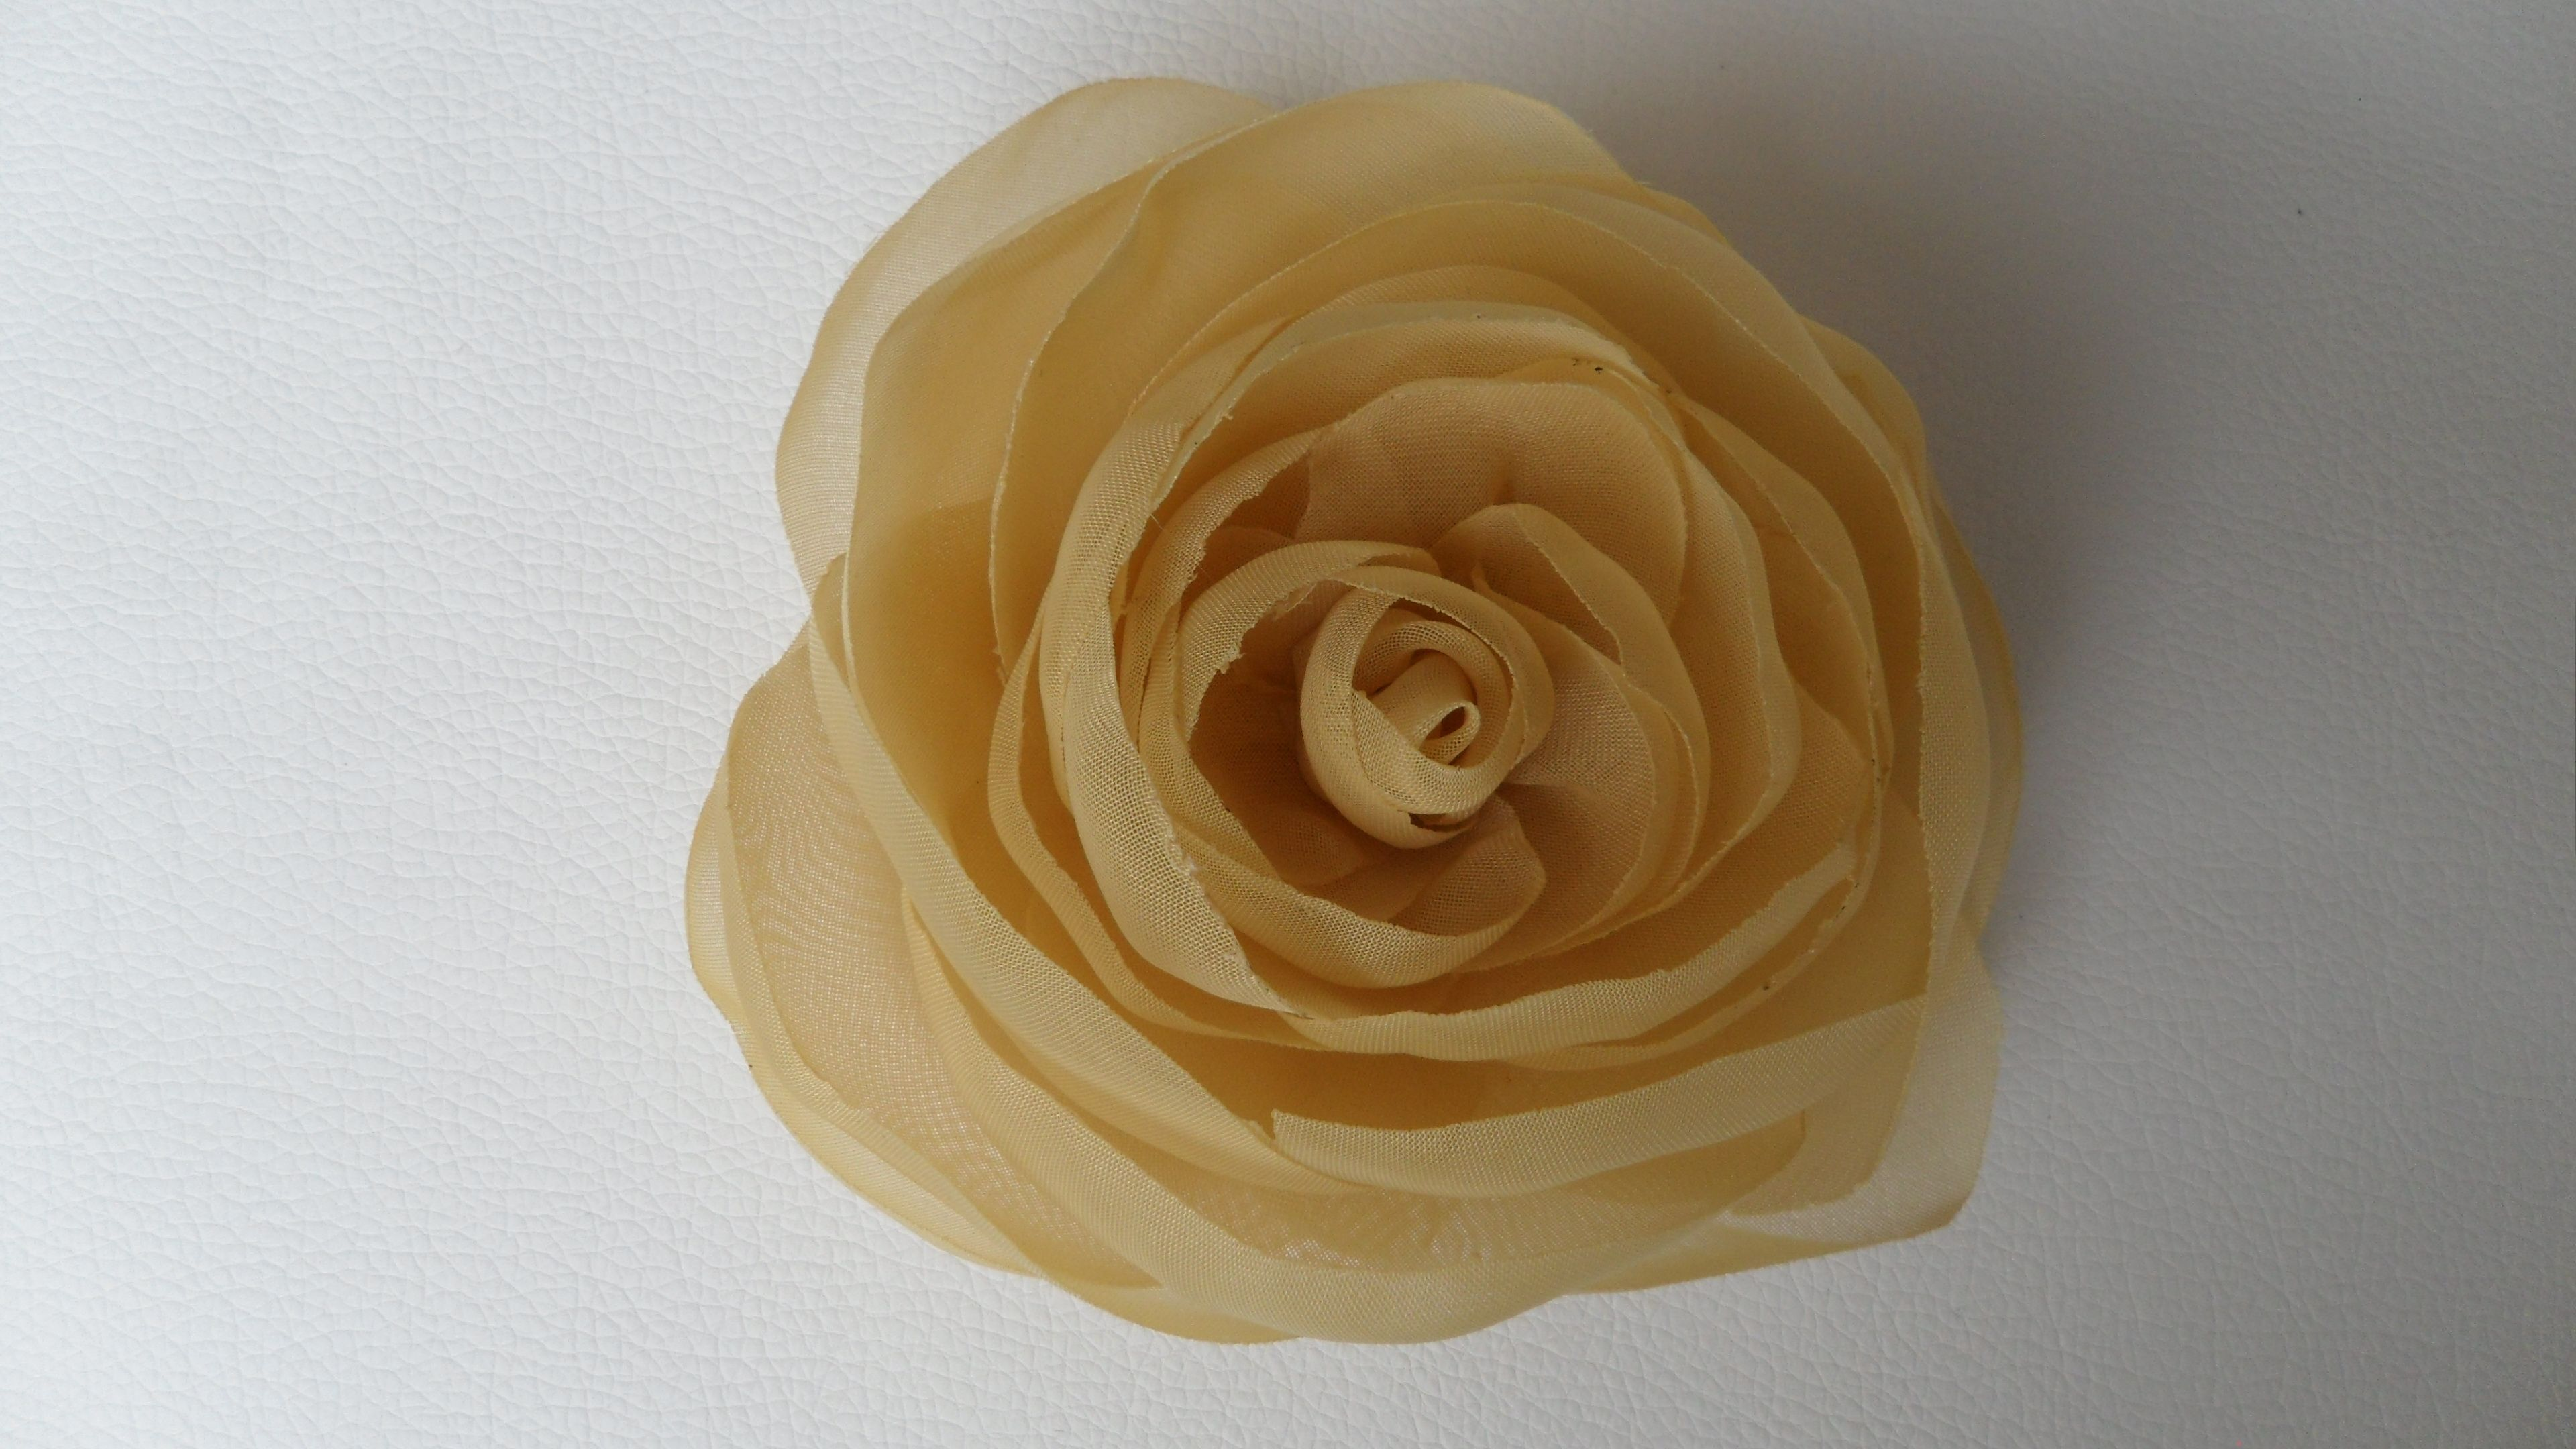 Flor a laser - jussarasantos.weebly.com